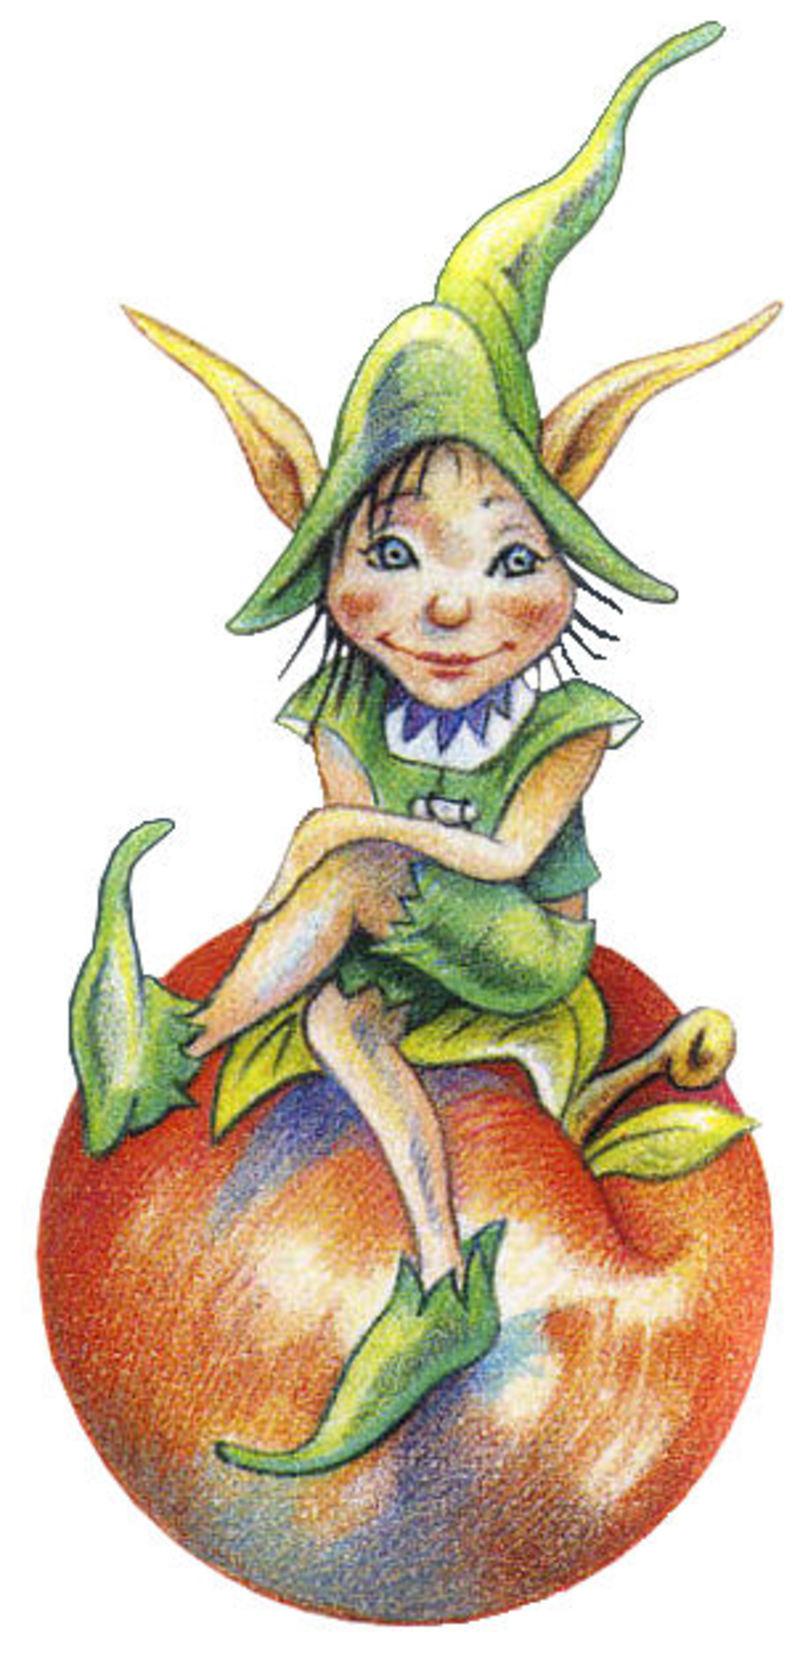 Tubes fees elfes lutins - Dessin elfes et fees ...